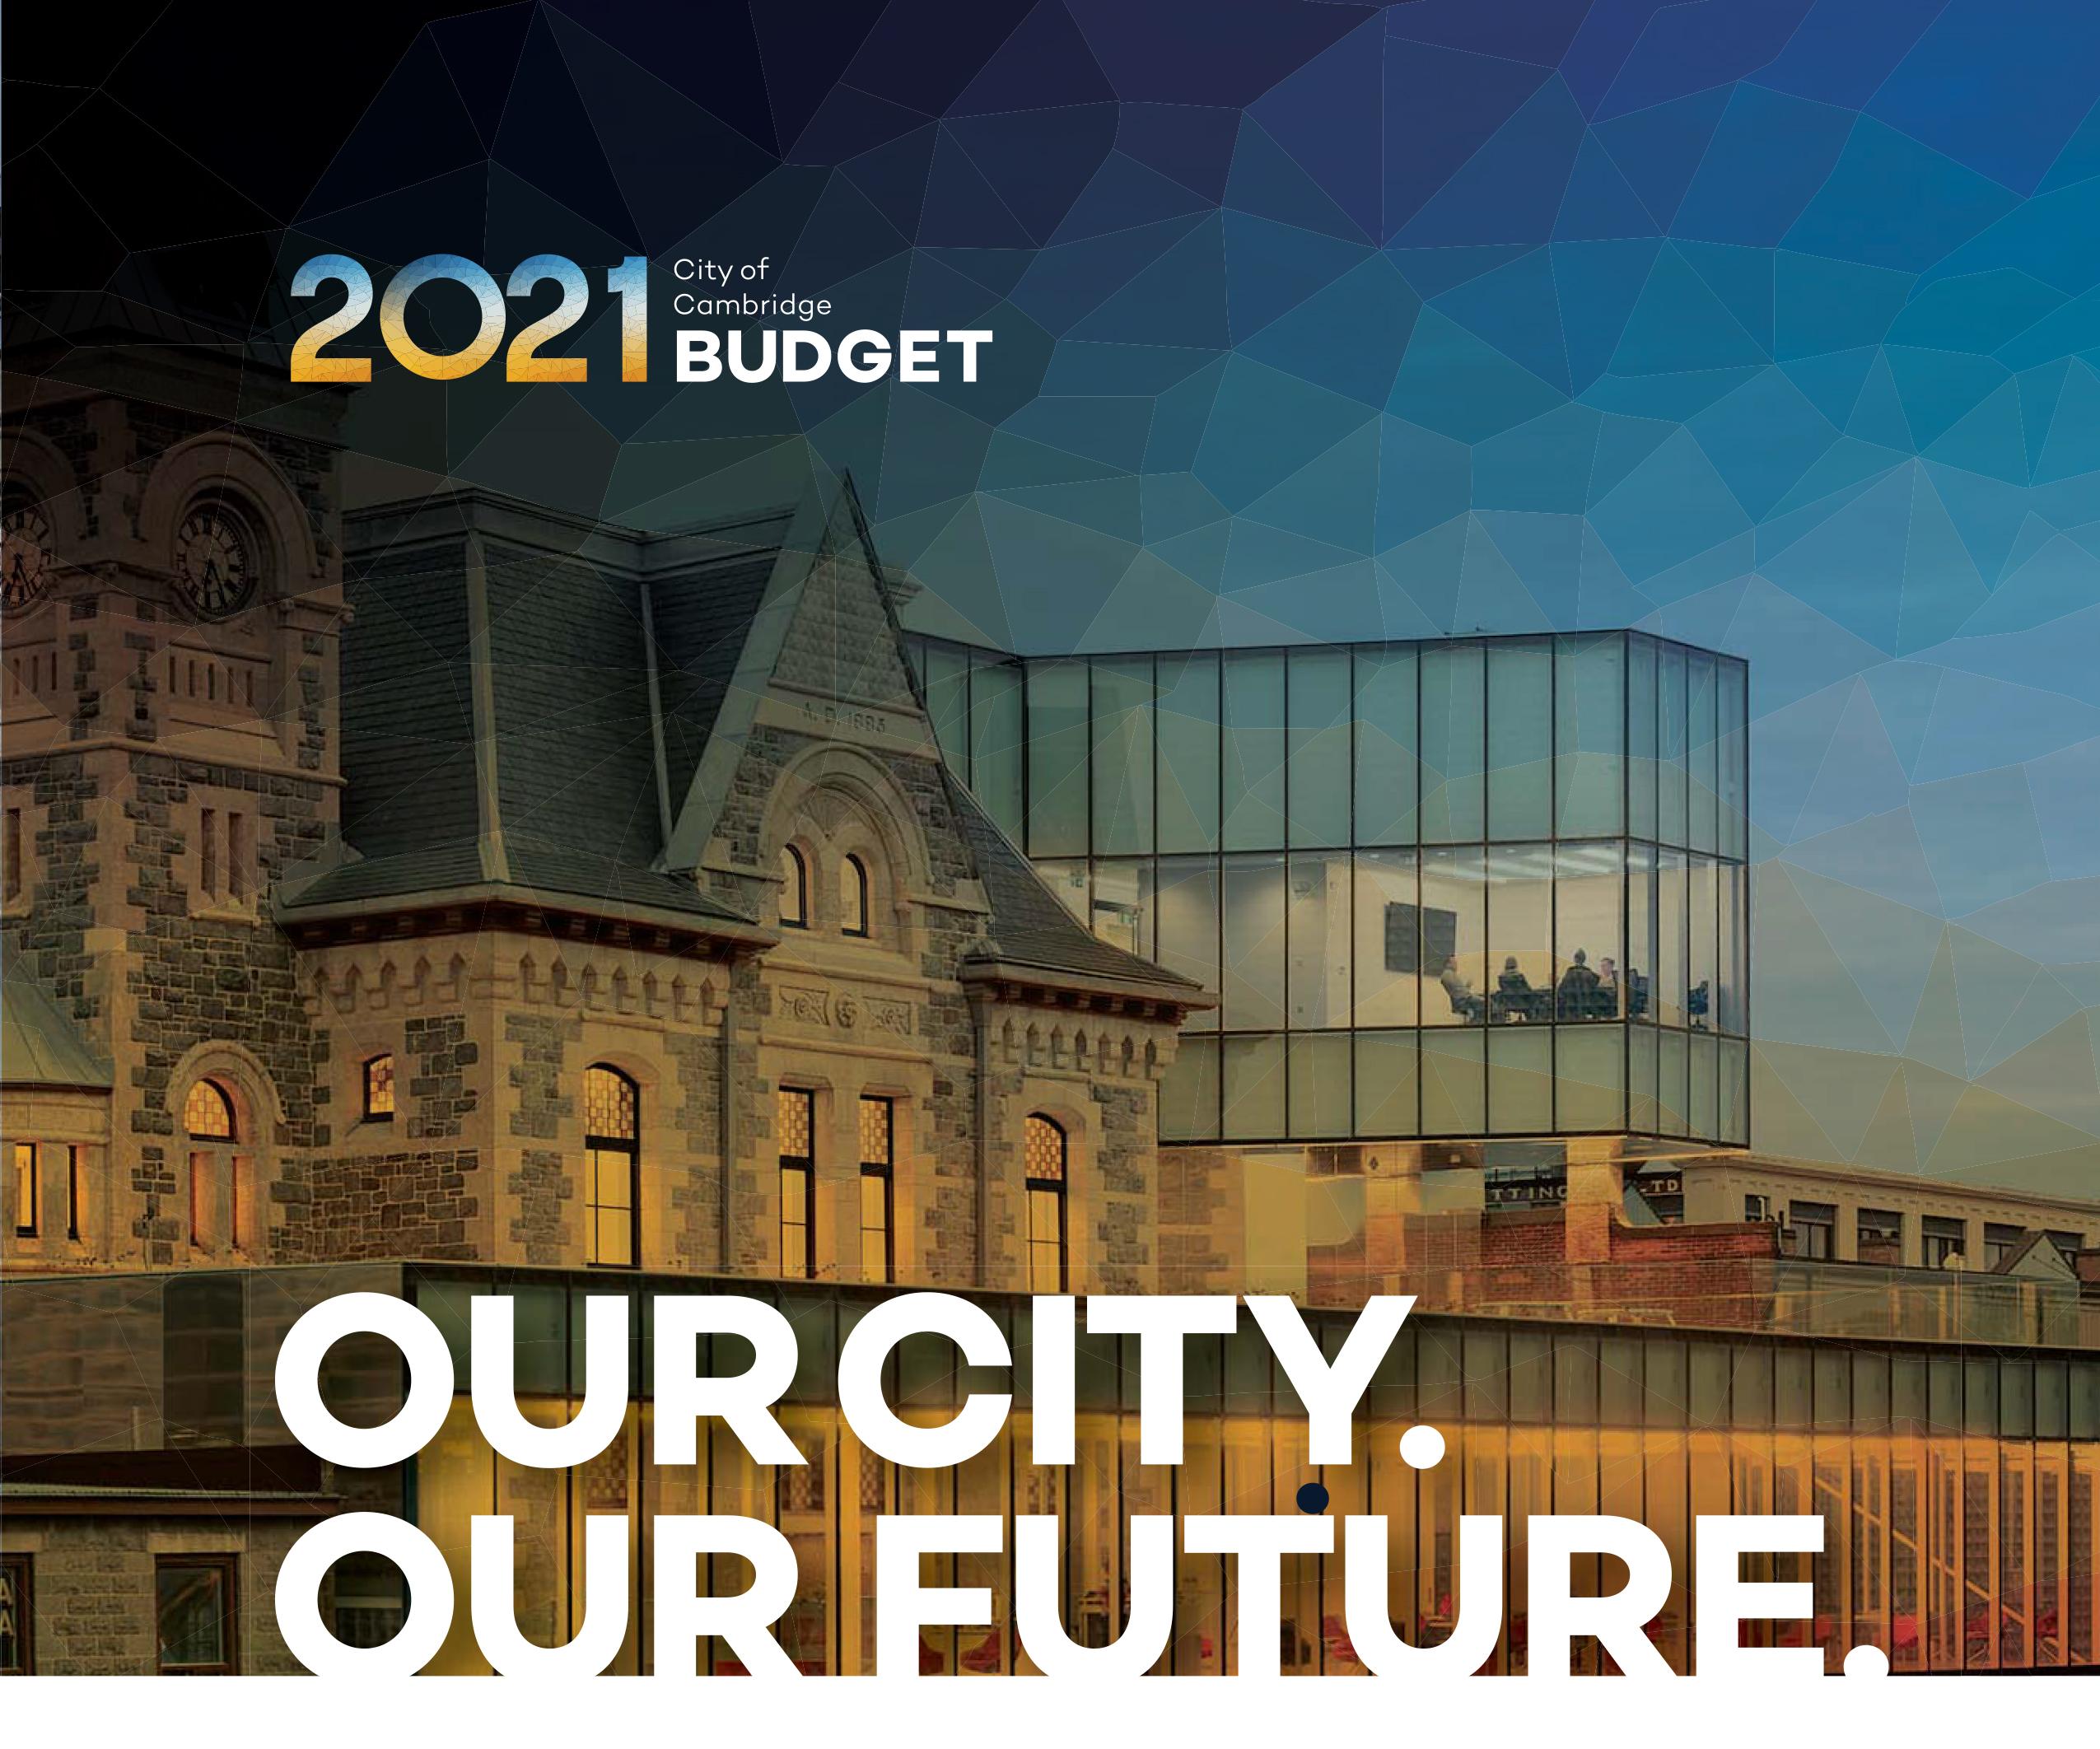 2021 Budget